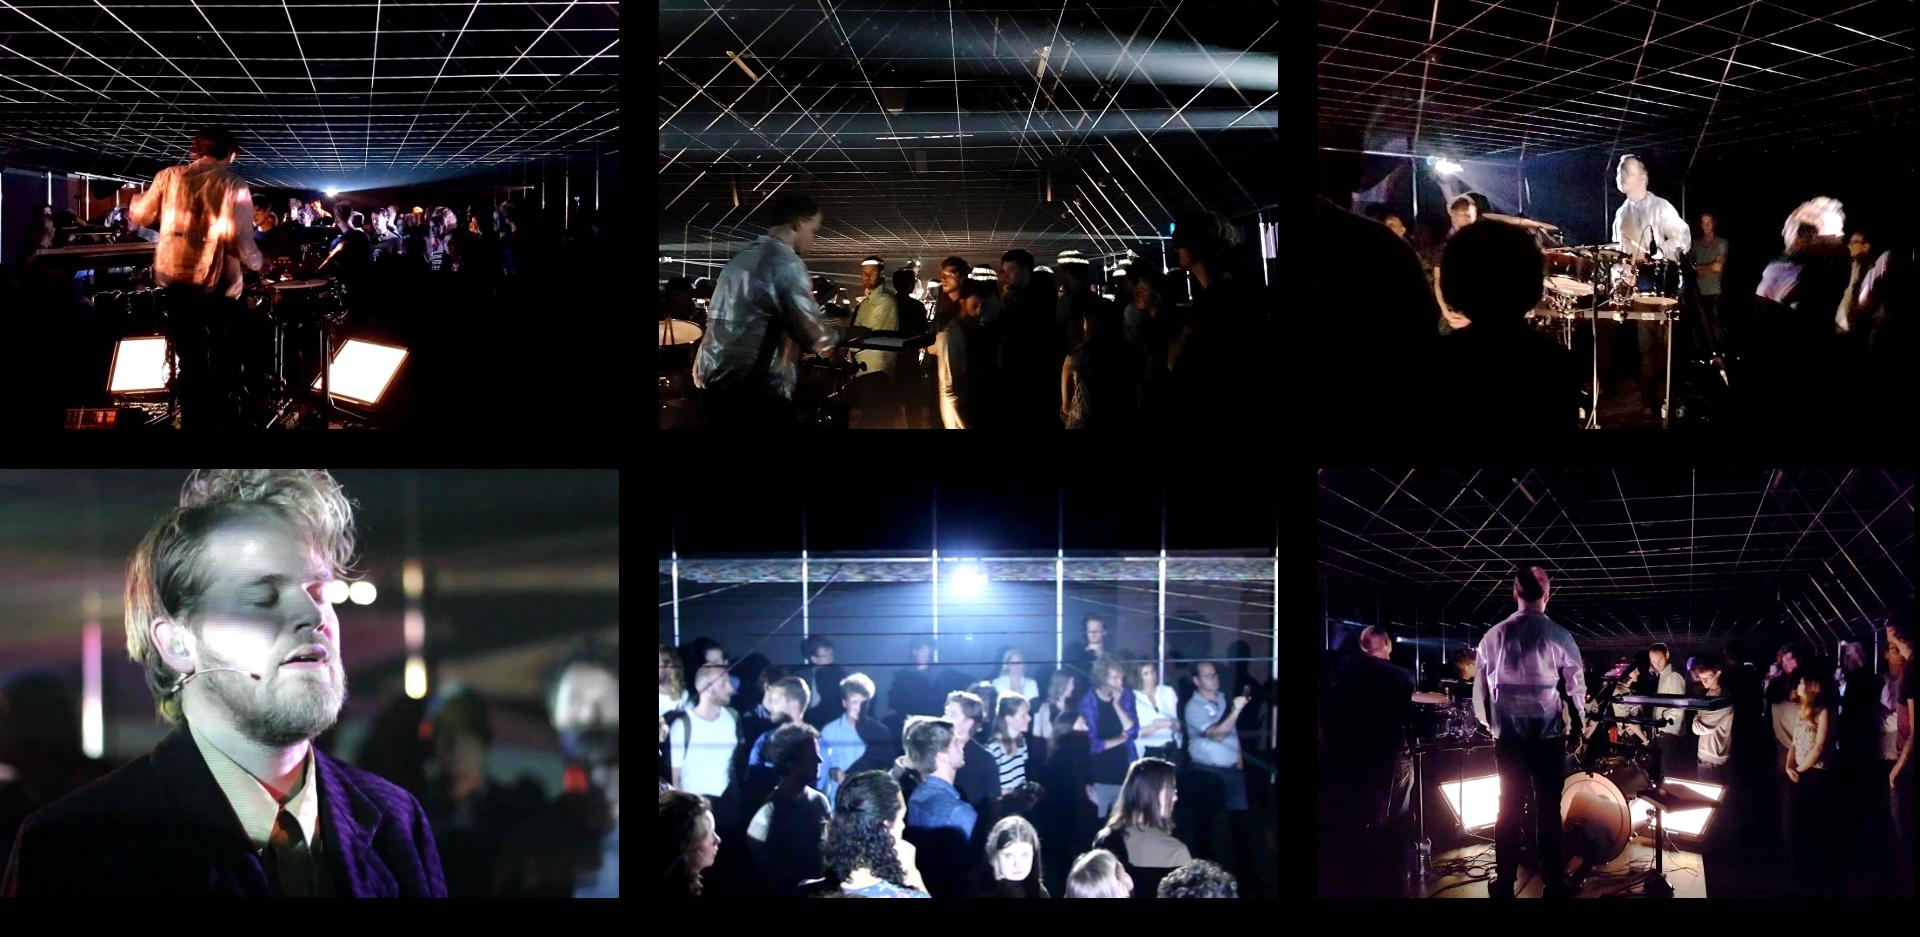 Future_Concert_Images